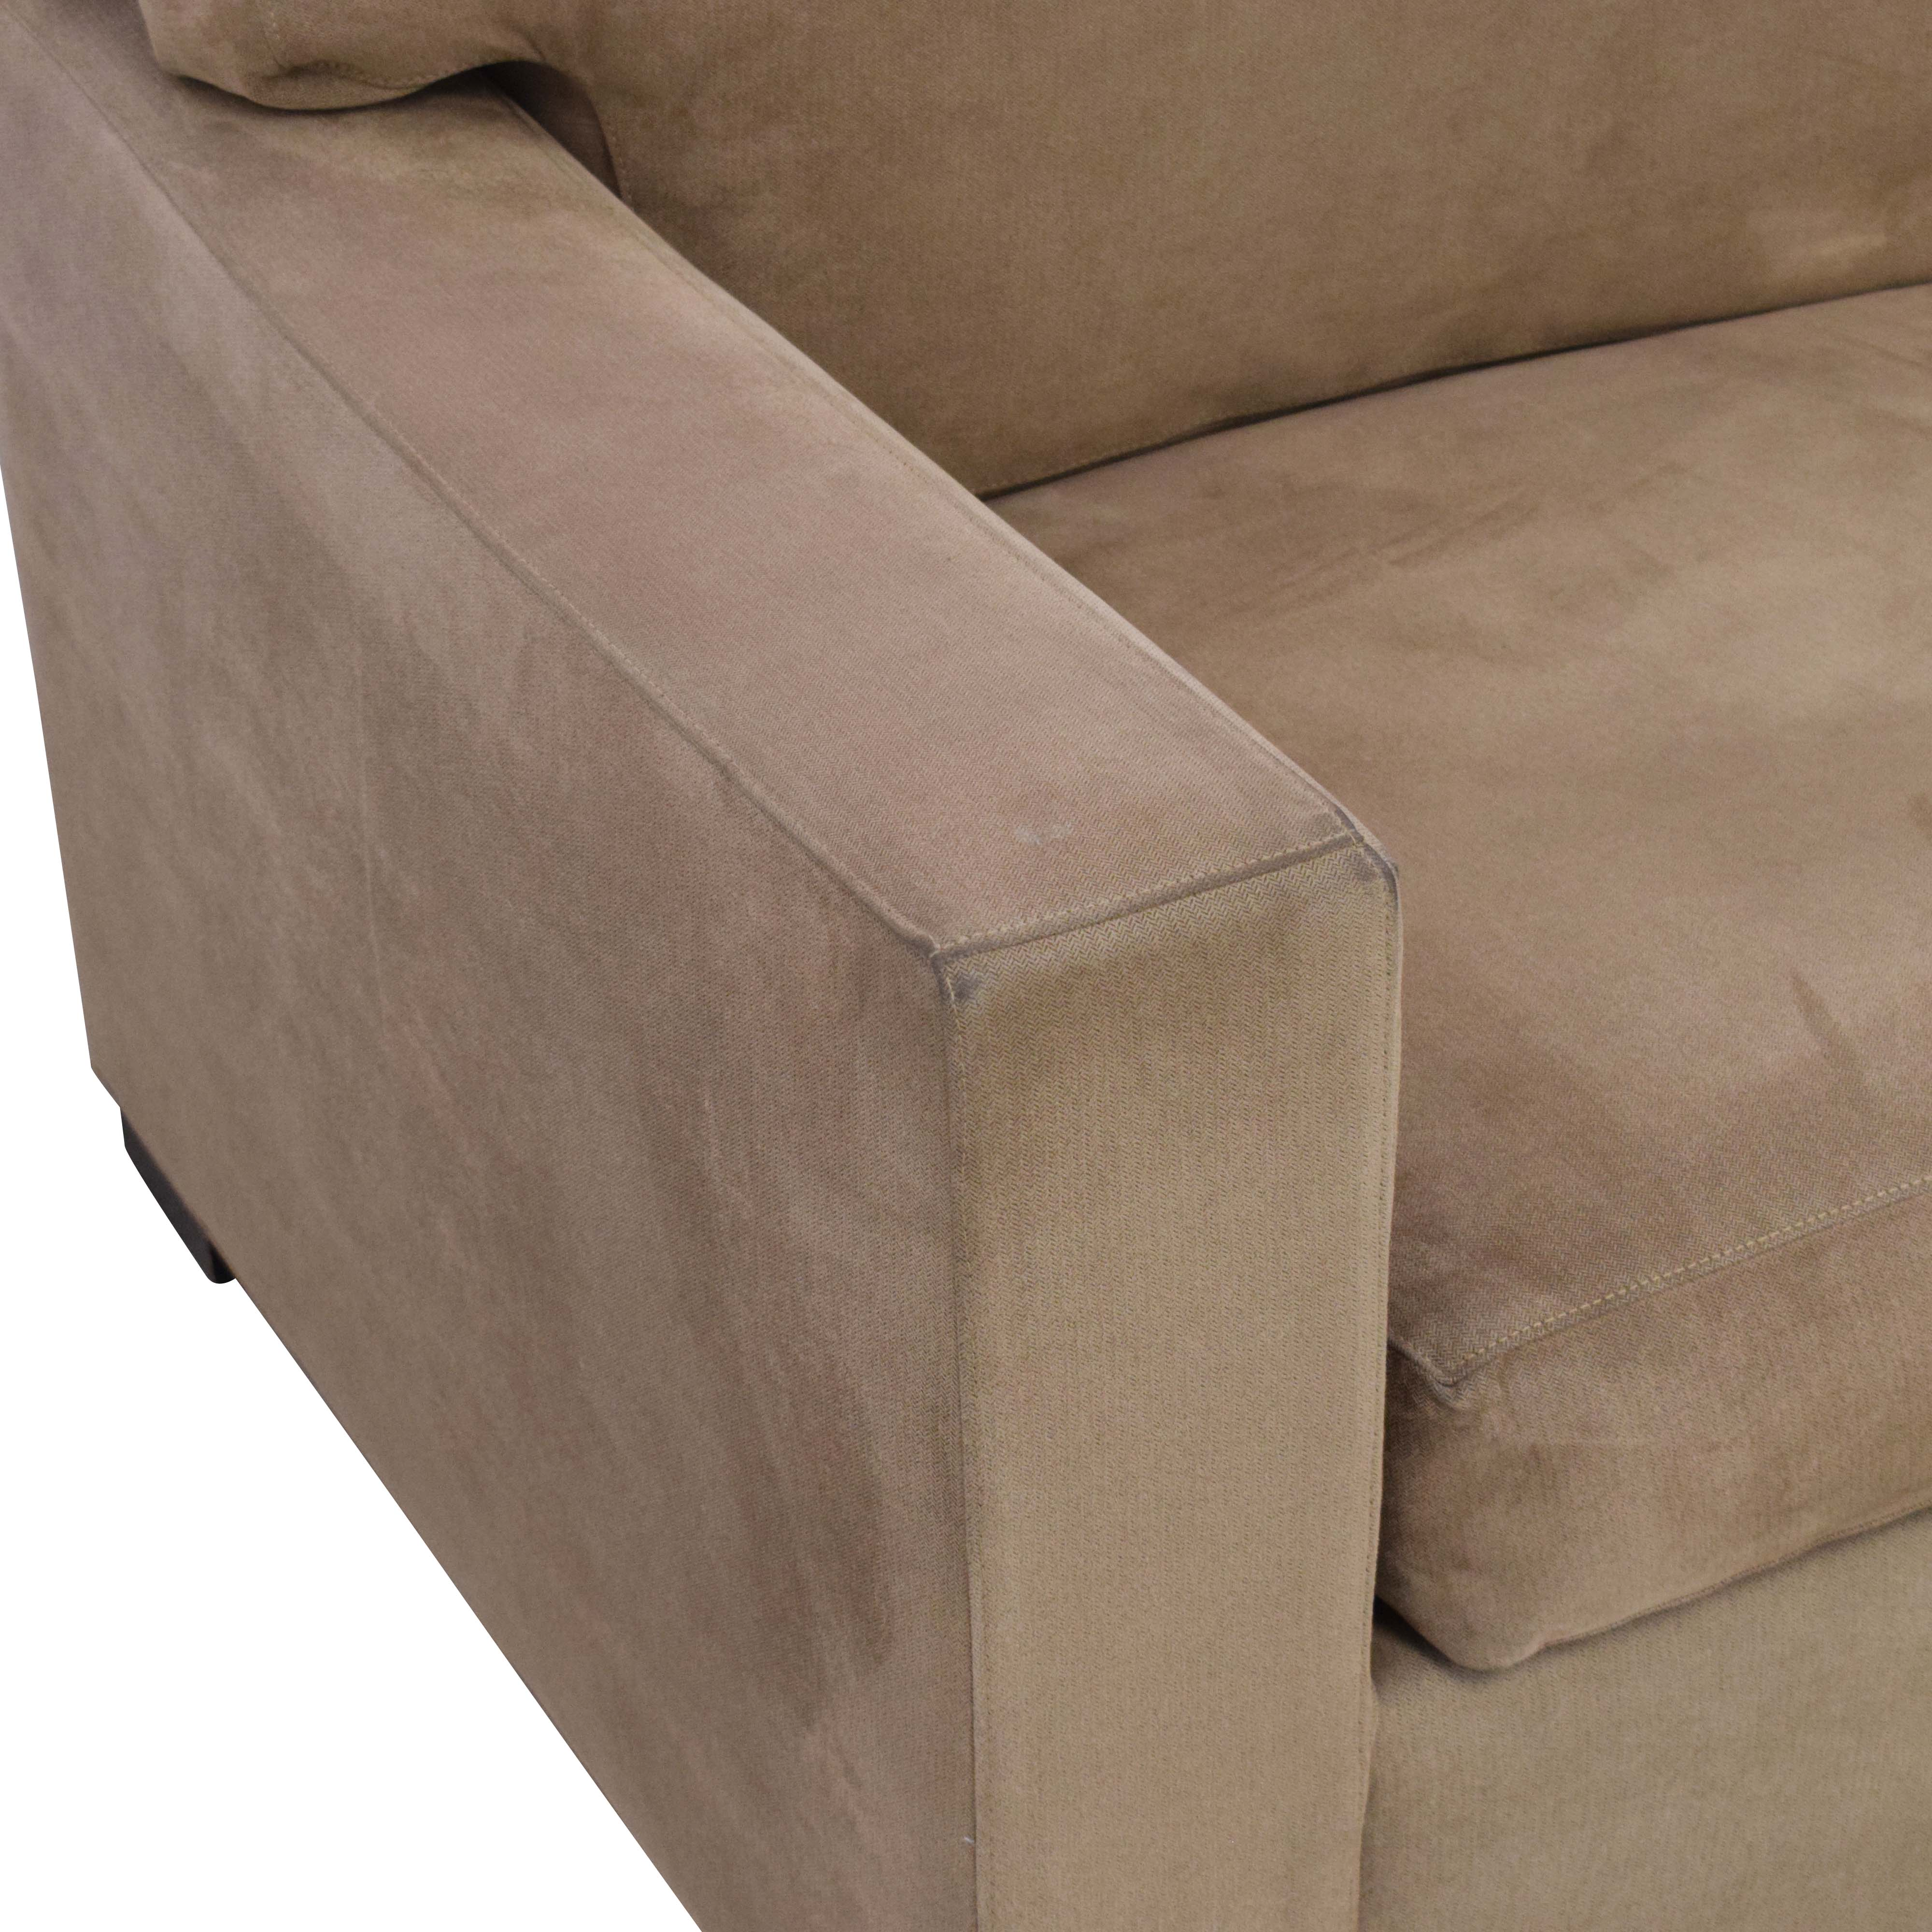 Crate & Barrel Crate & Barrel Axis II 3-Piece Sectional Sofa price